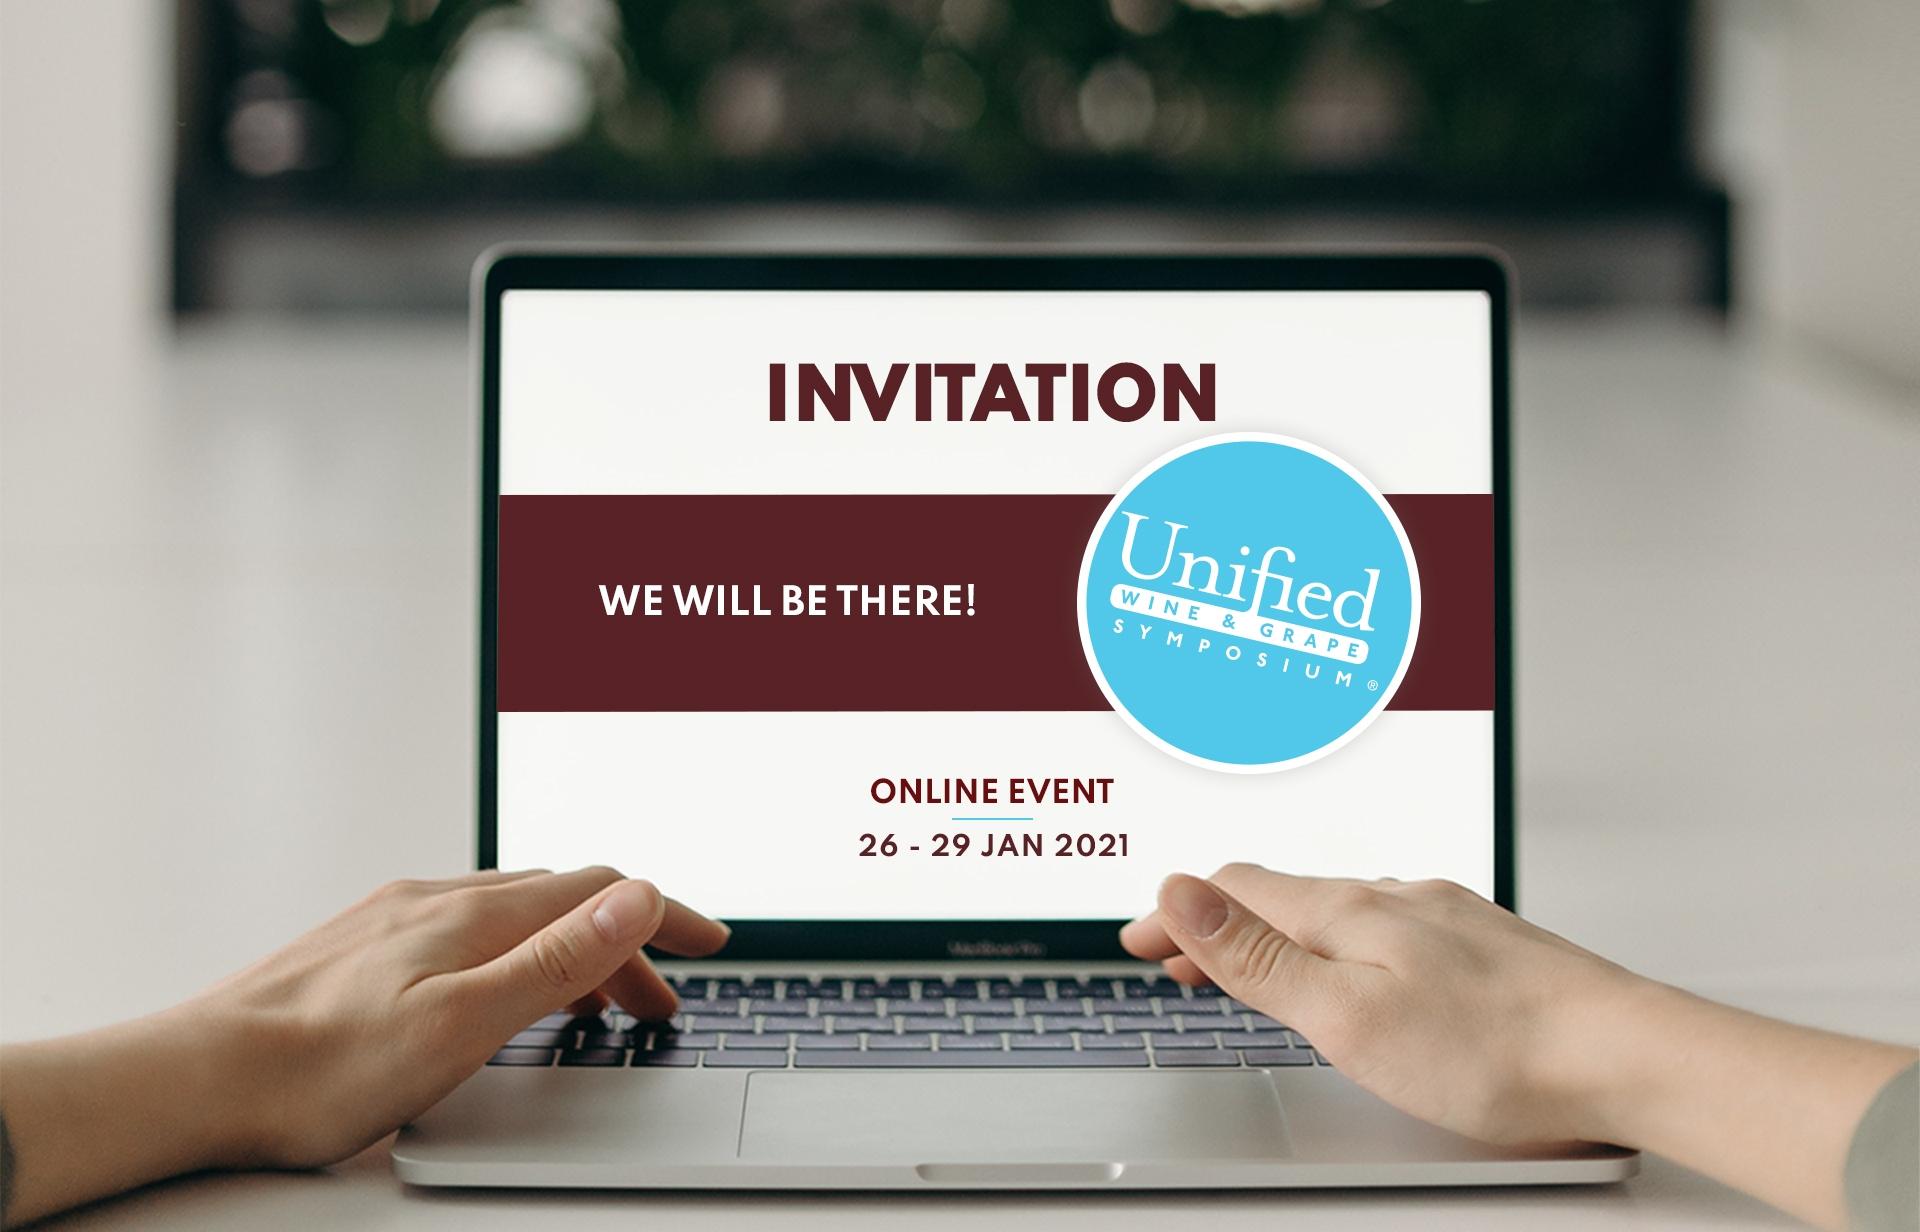 WINEGRID - Unified Symposium 2021